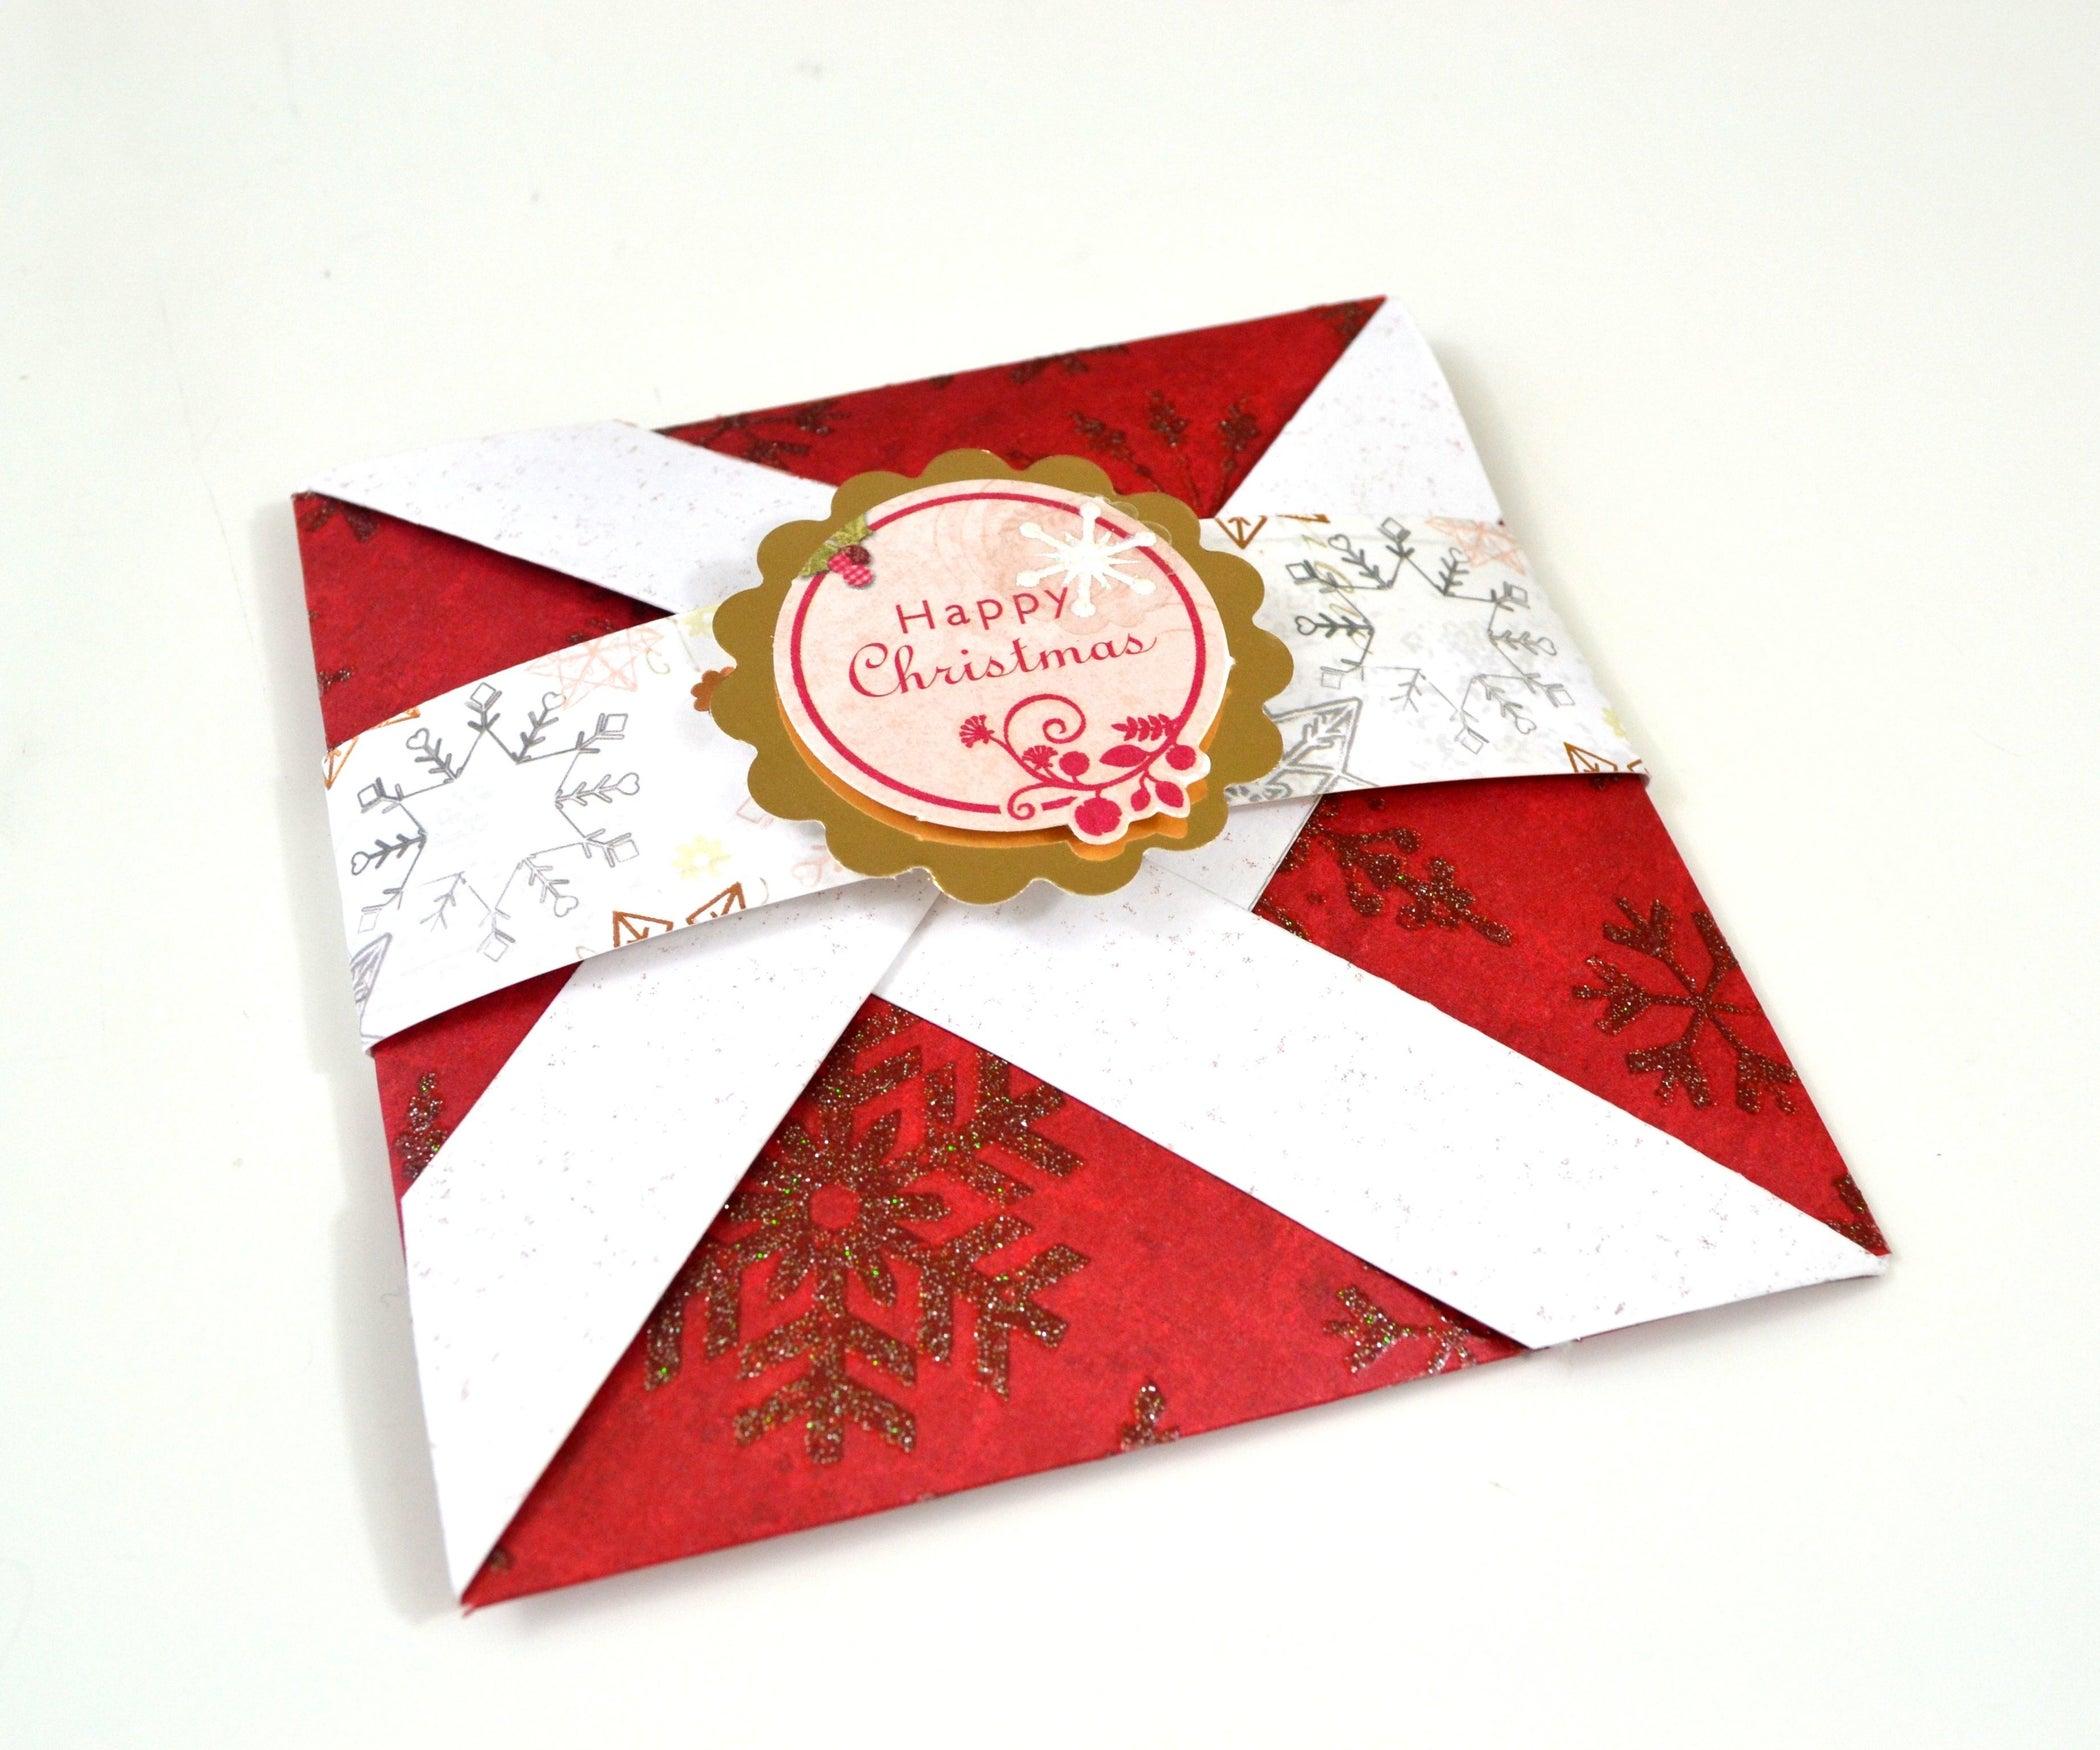 Pop Up Card How To Make Pinwheel Folding Card For Christmas 16